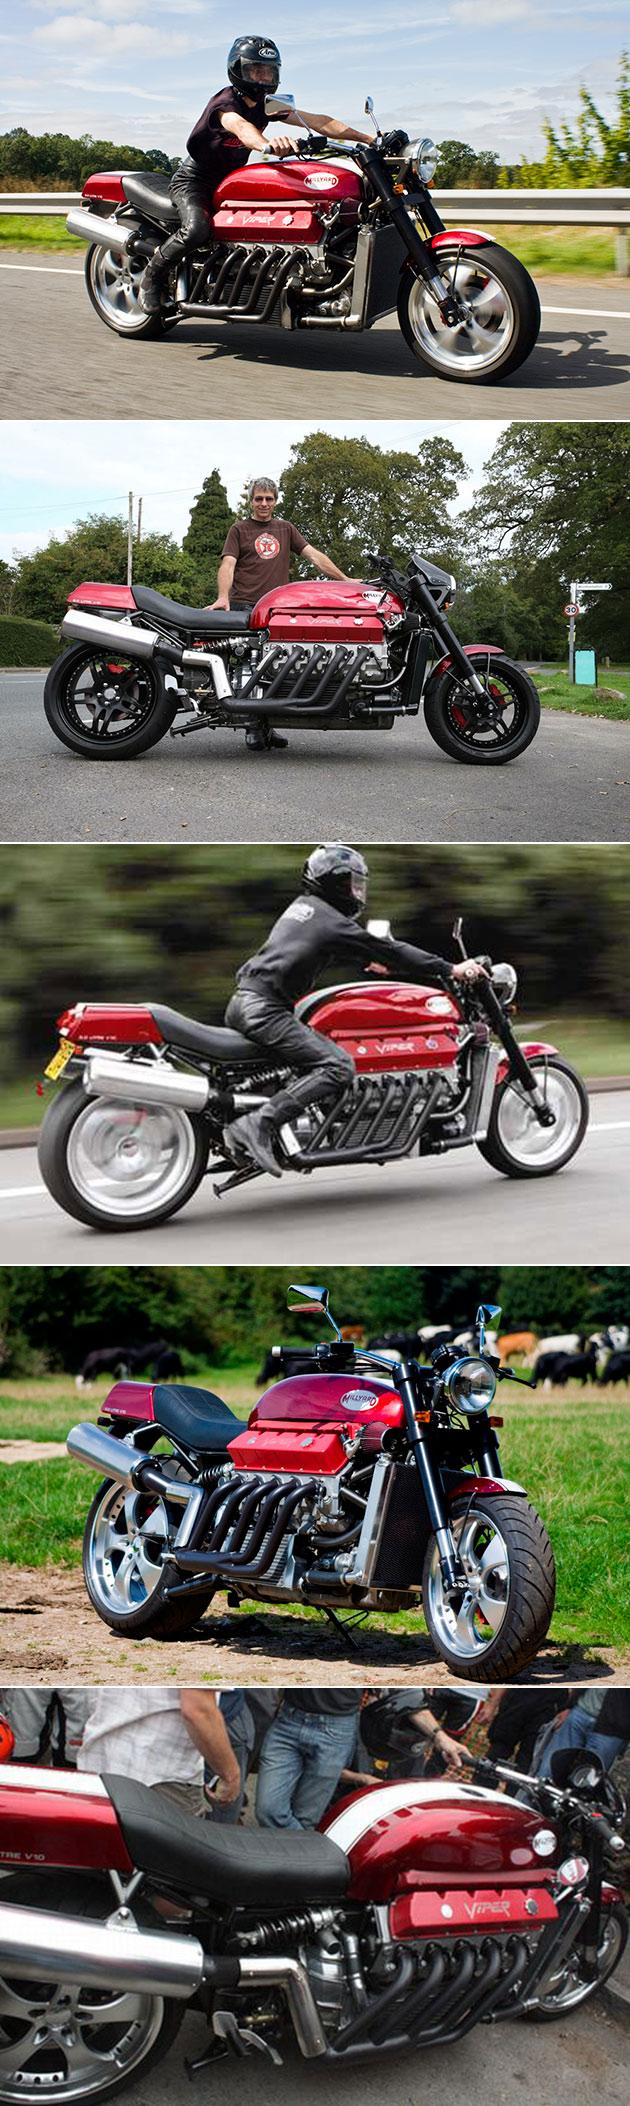 millyard-viper-v10-motorcycle